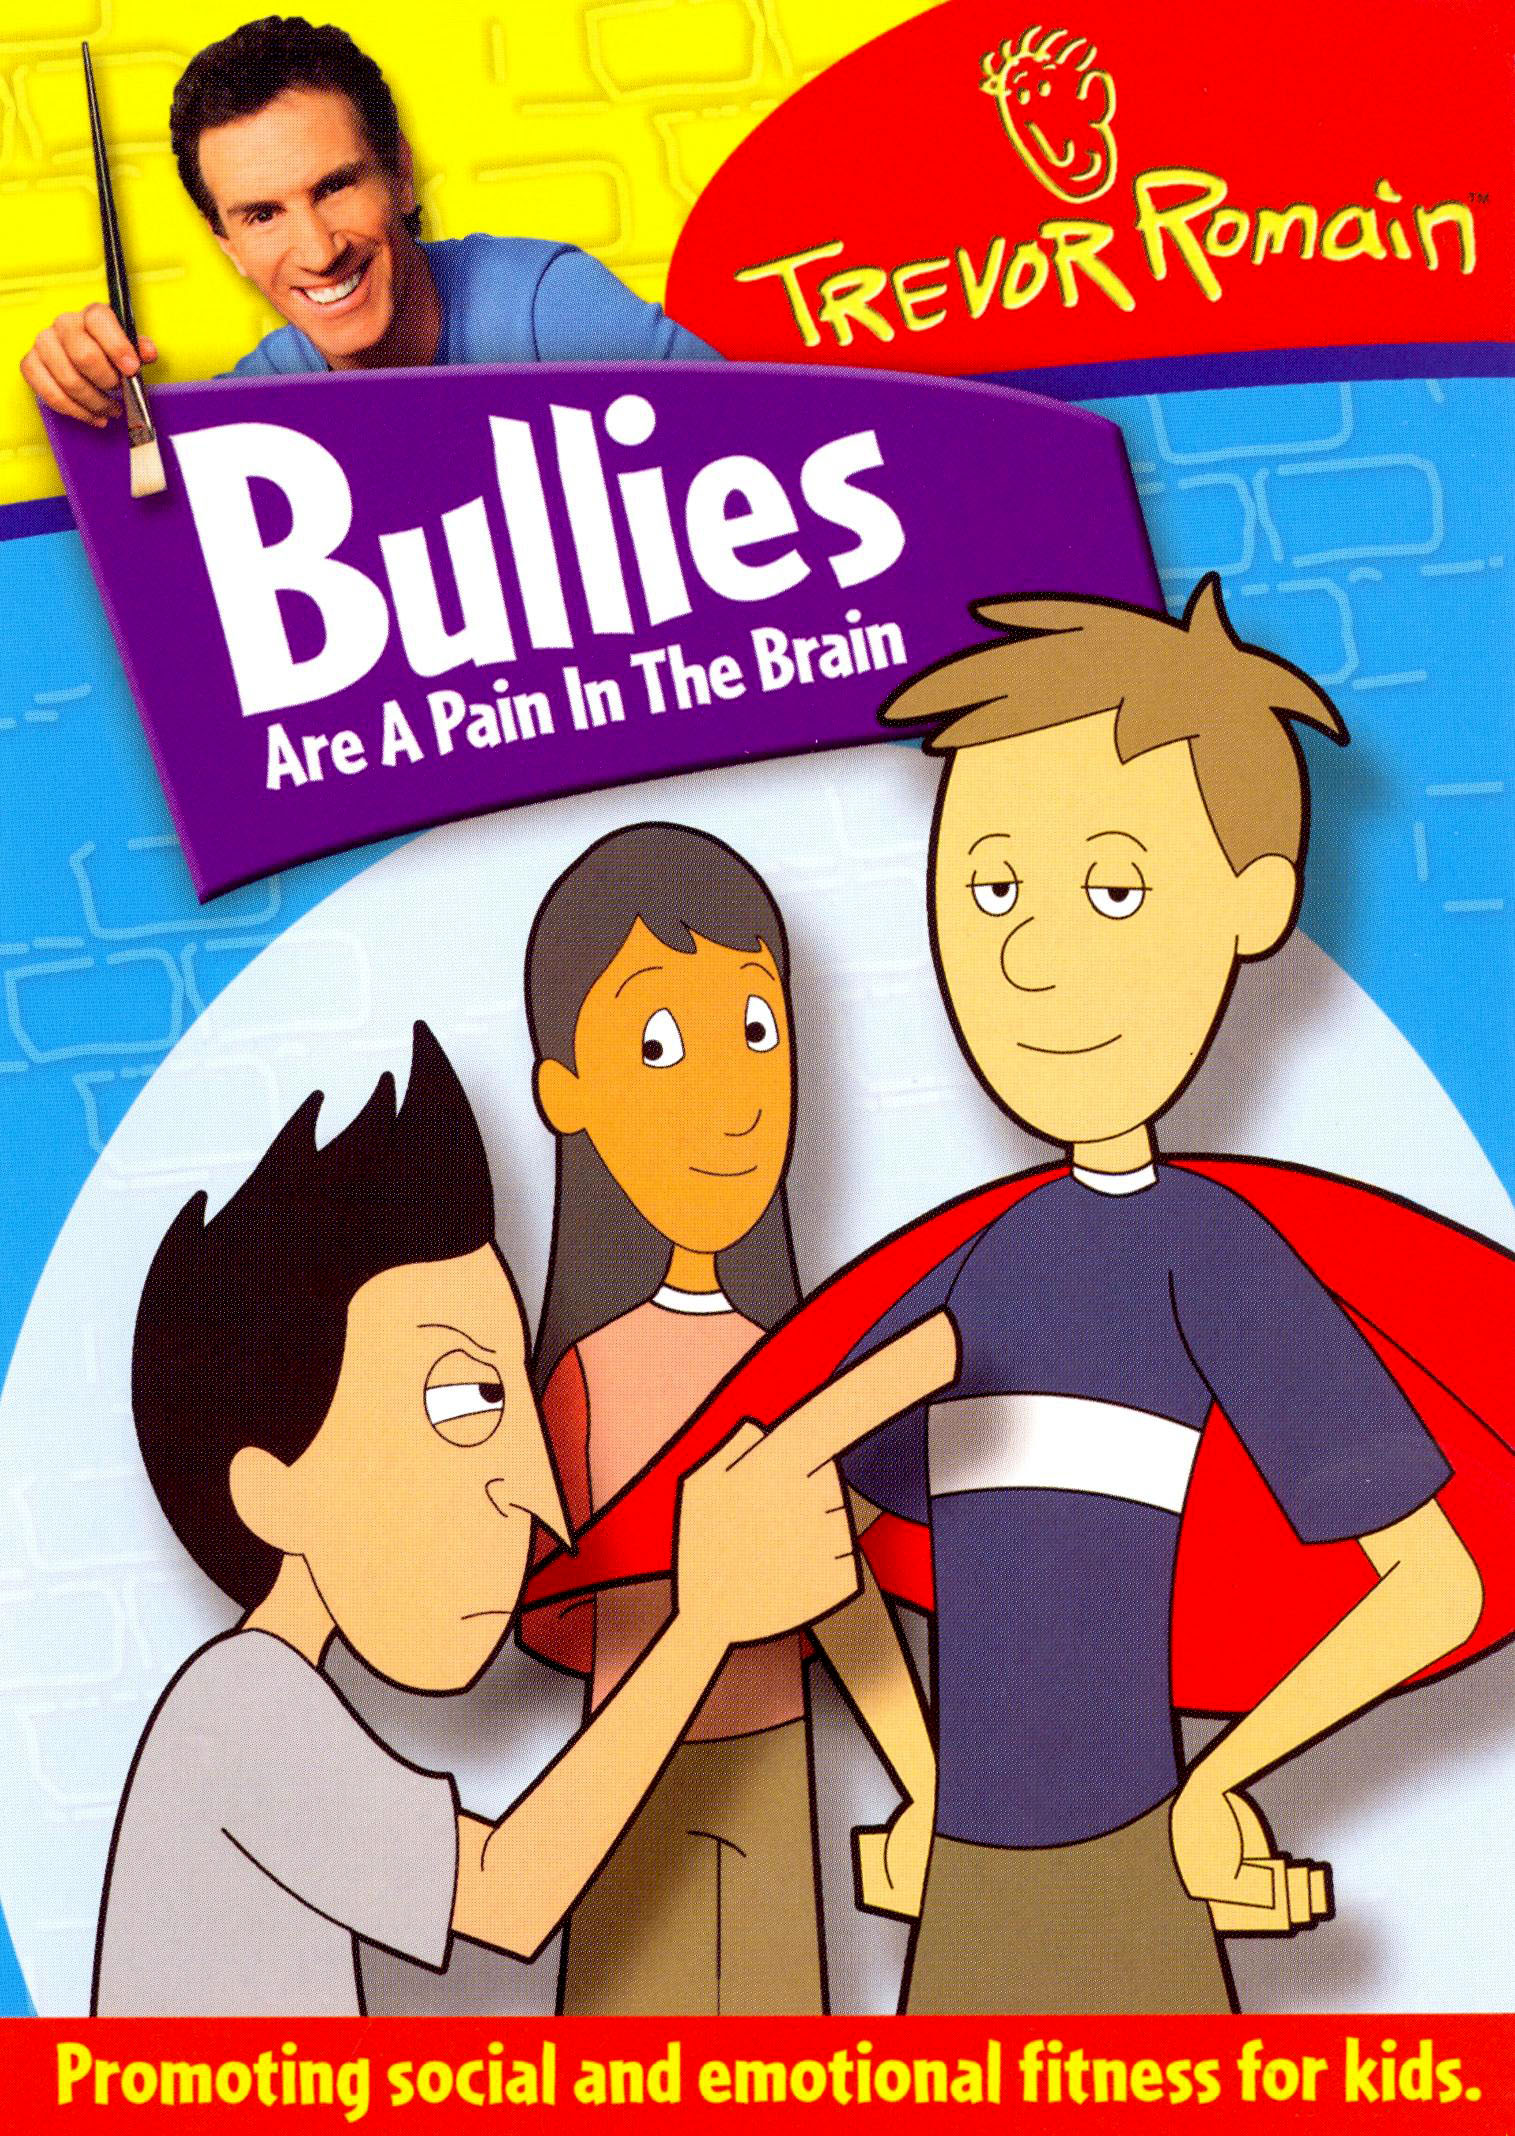 Trevor Romain: Bullies Are a Pain in the Brain